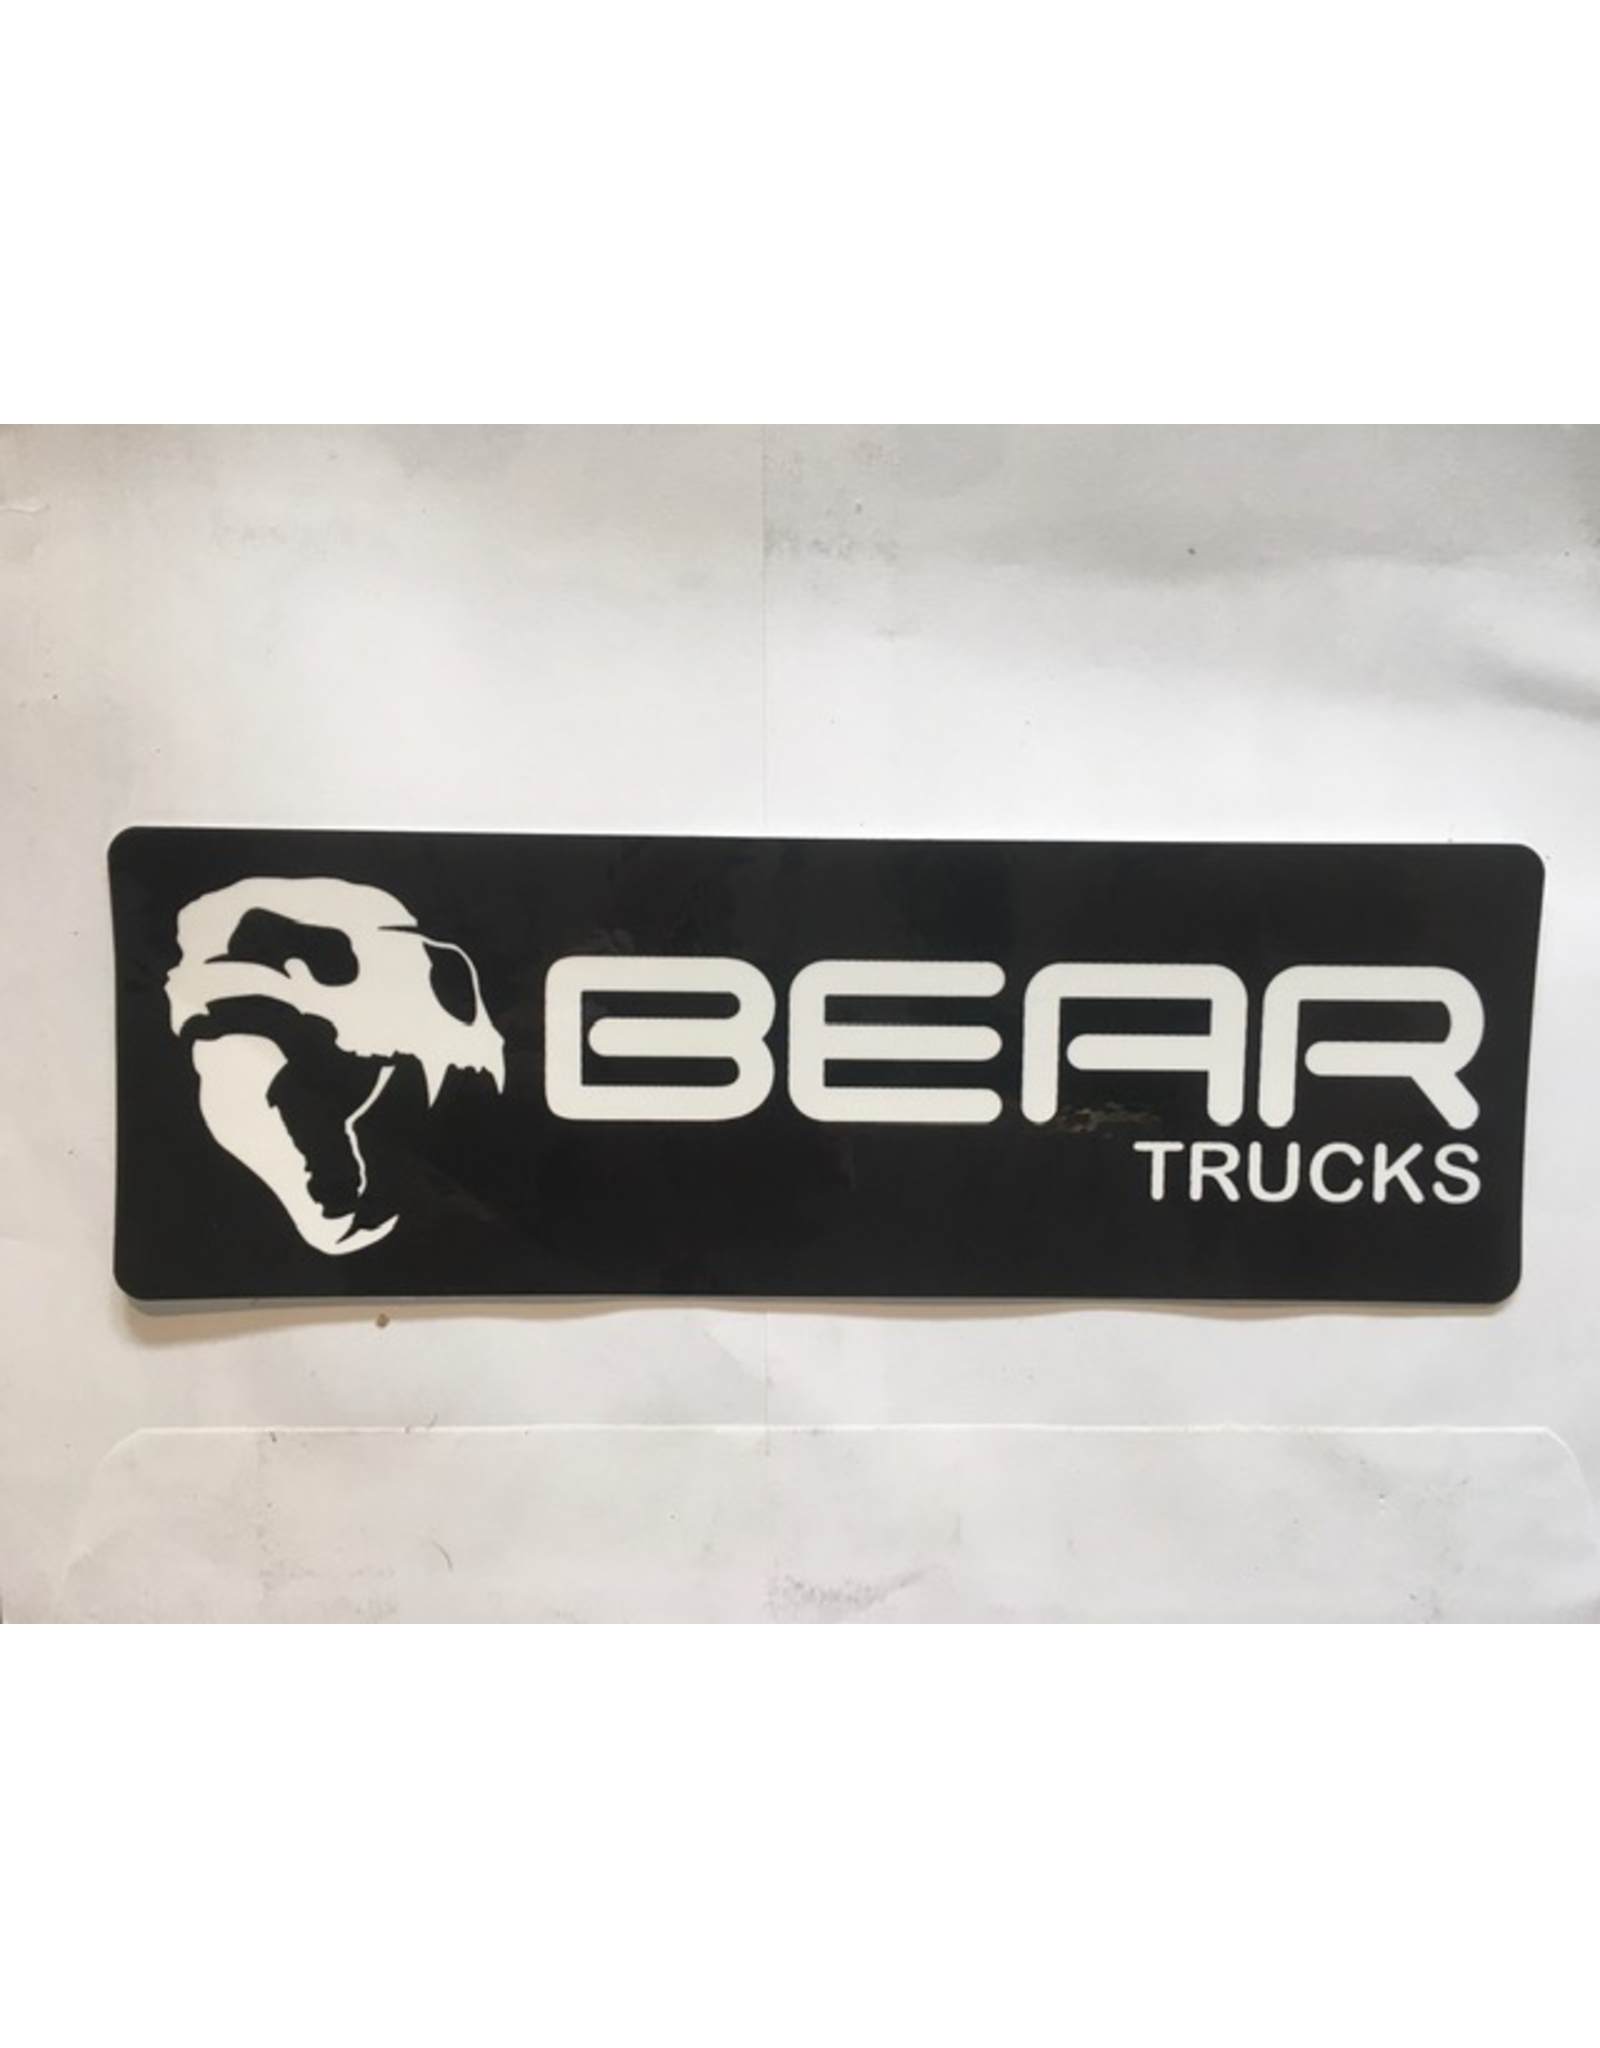 BEAR TRUCKS LOGO STICKER, BLACK